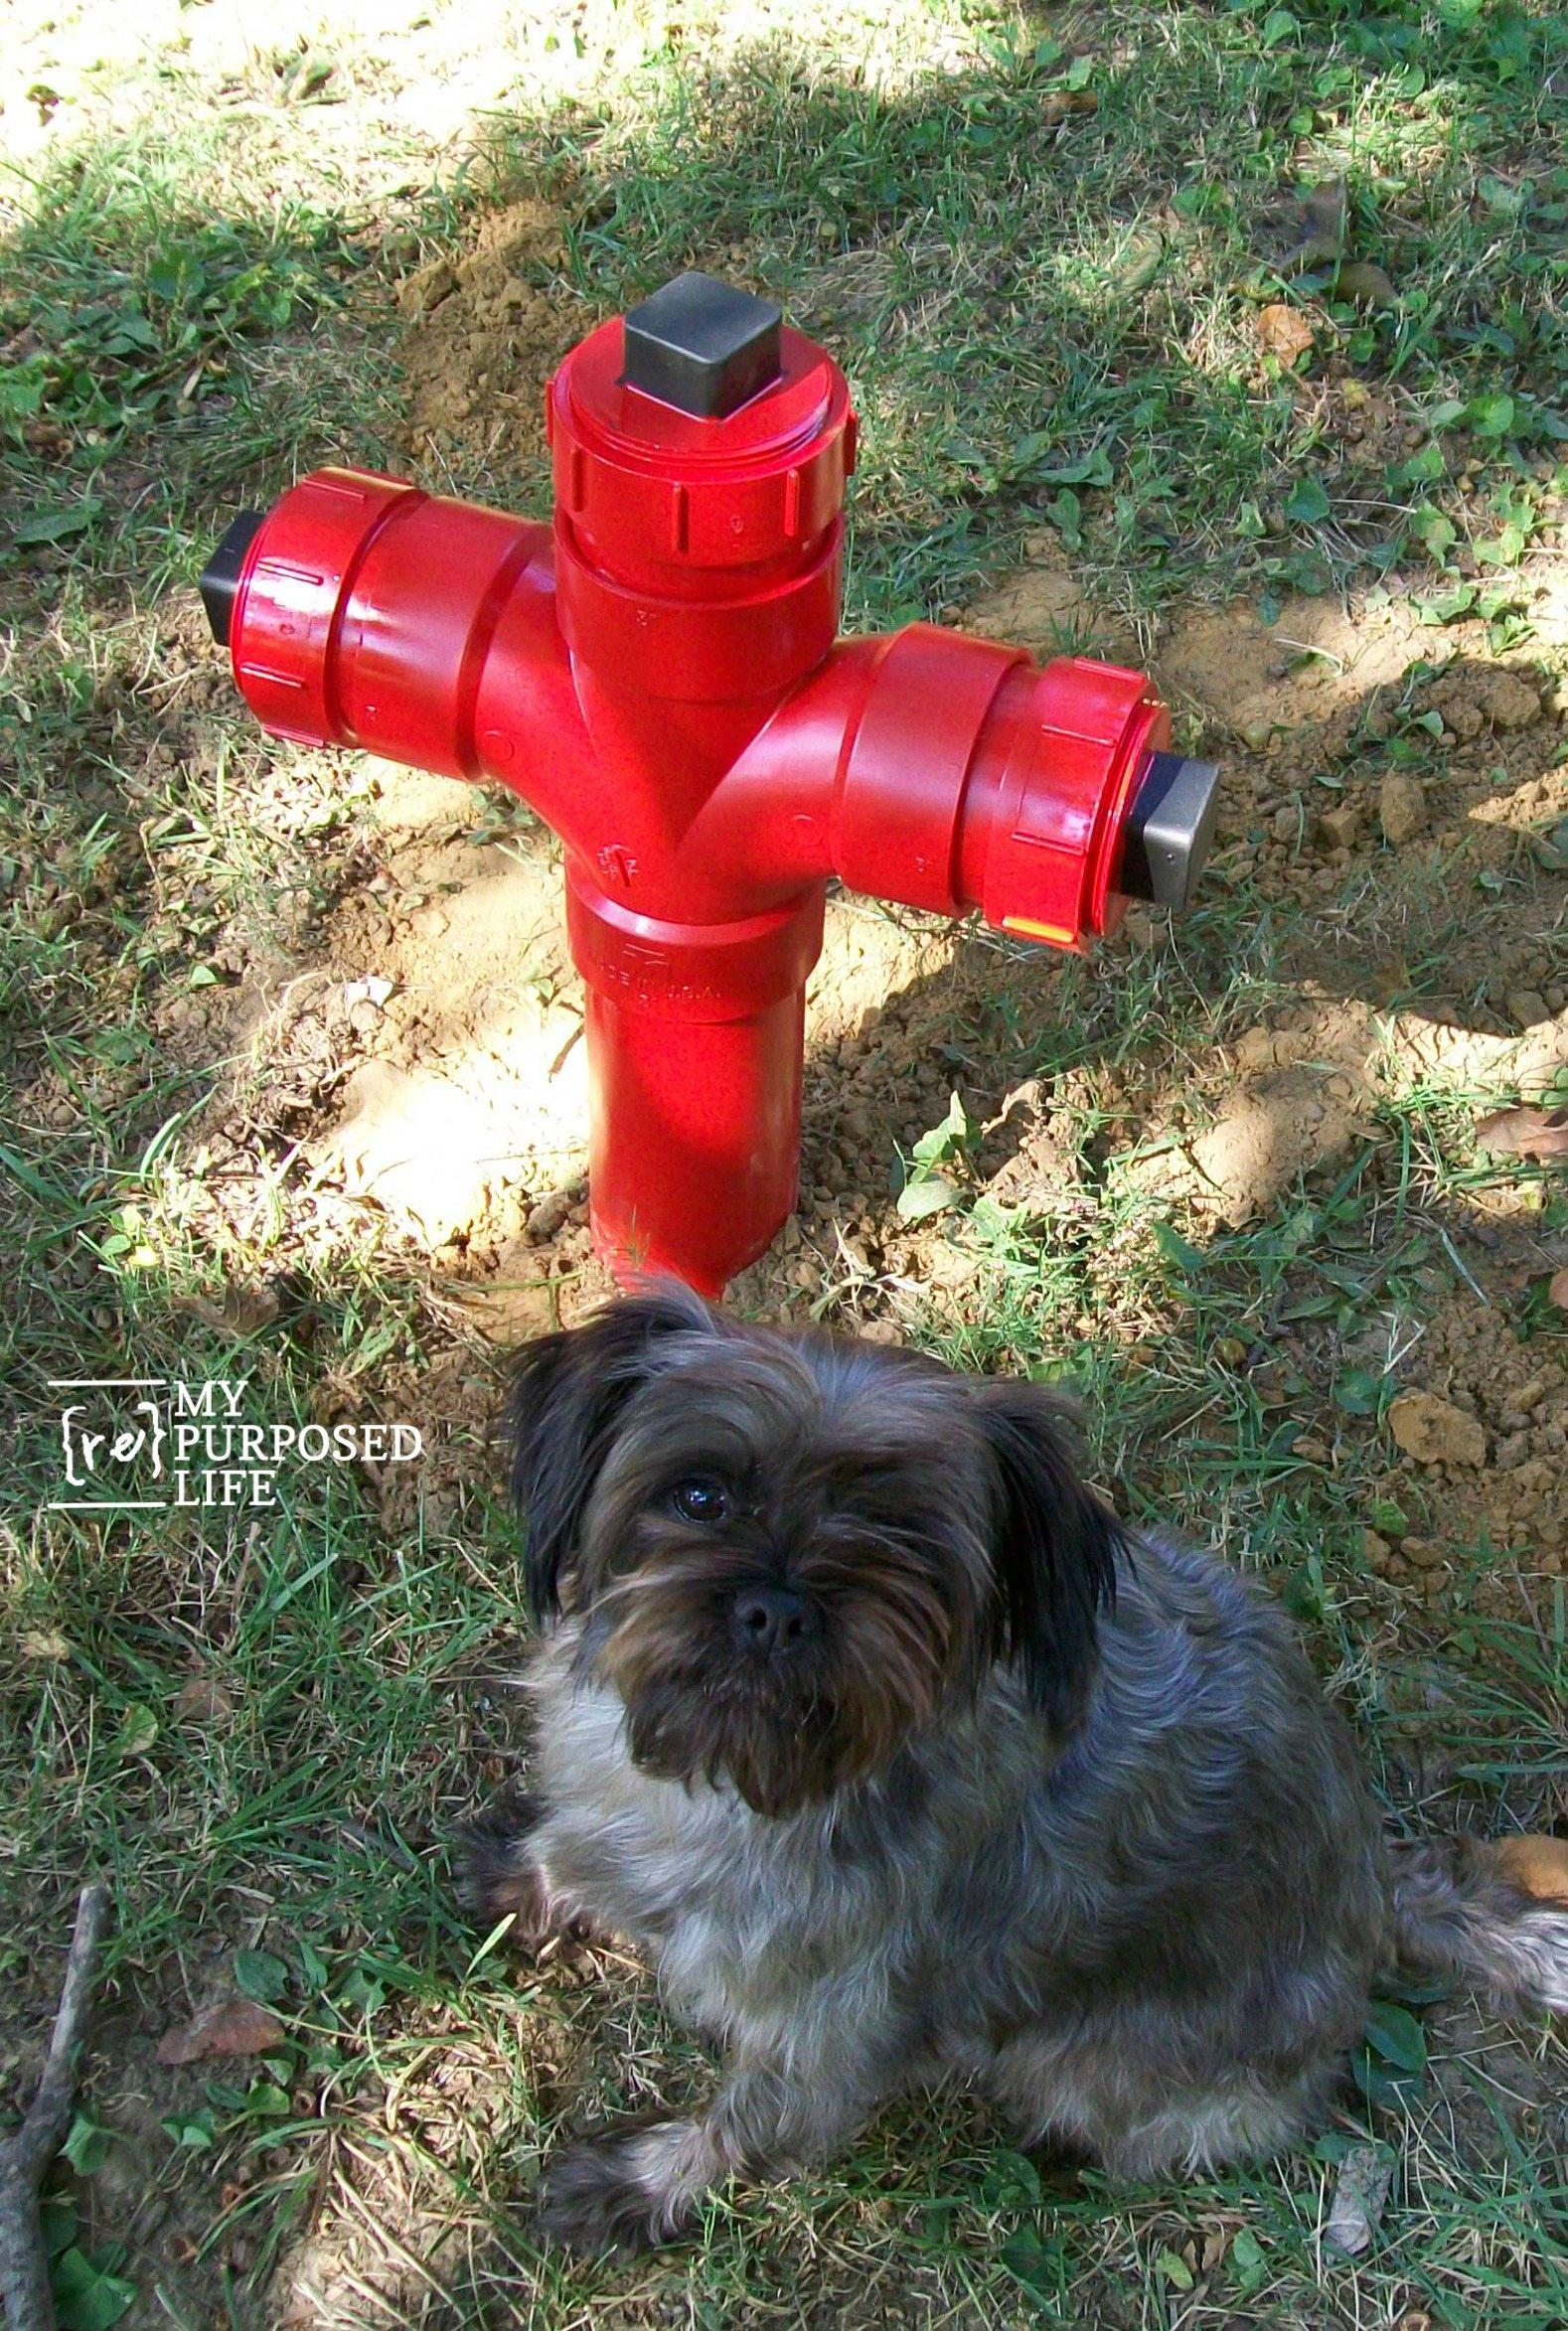 Diy Fire Hydrant My Repurposed Life 174